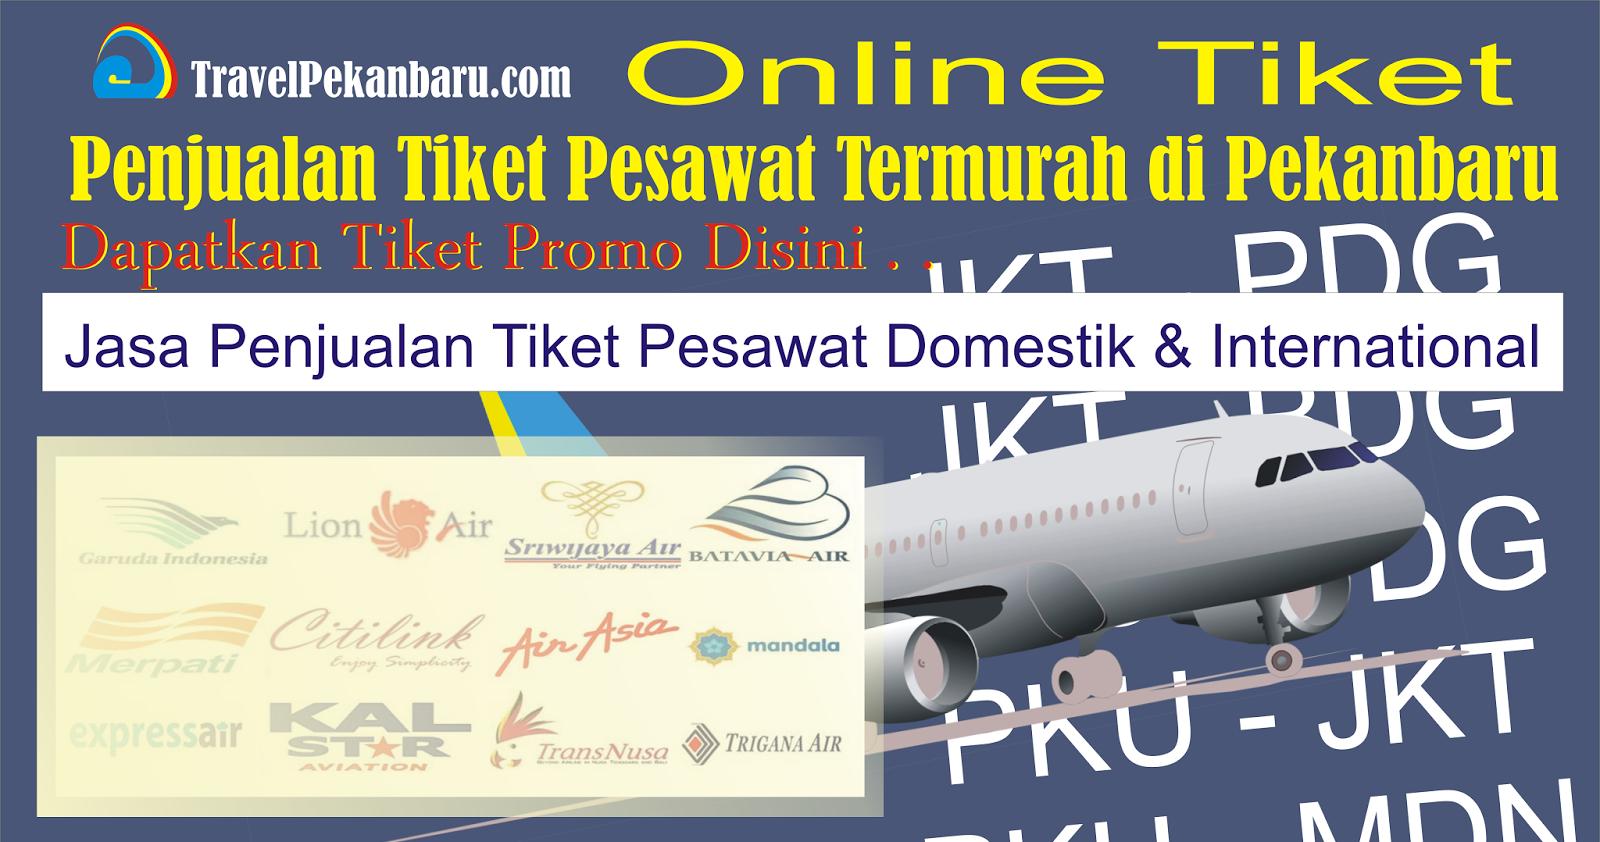 Dapatkan Tiket Pesawat Promo Di E Travela Travel Pekanbaru